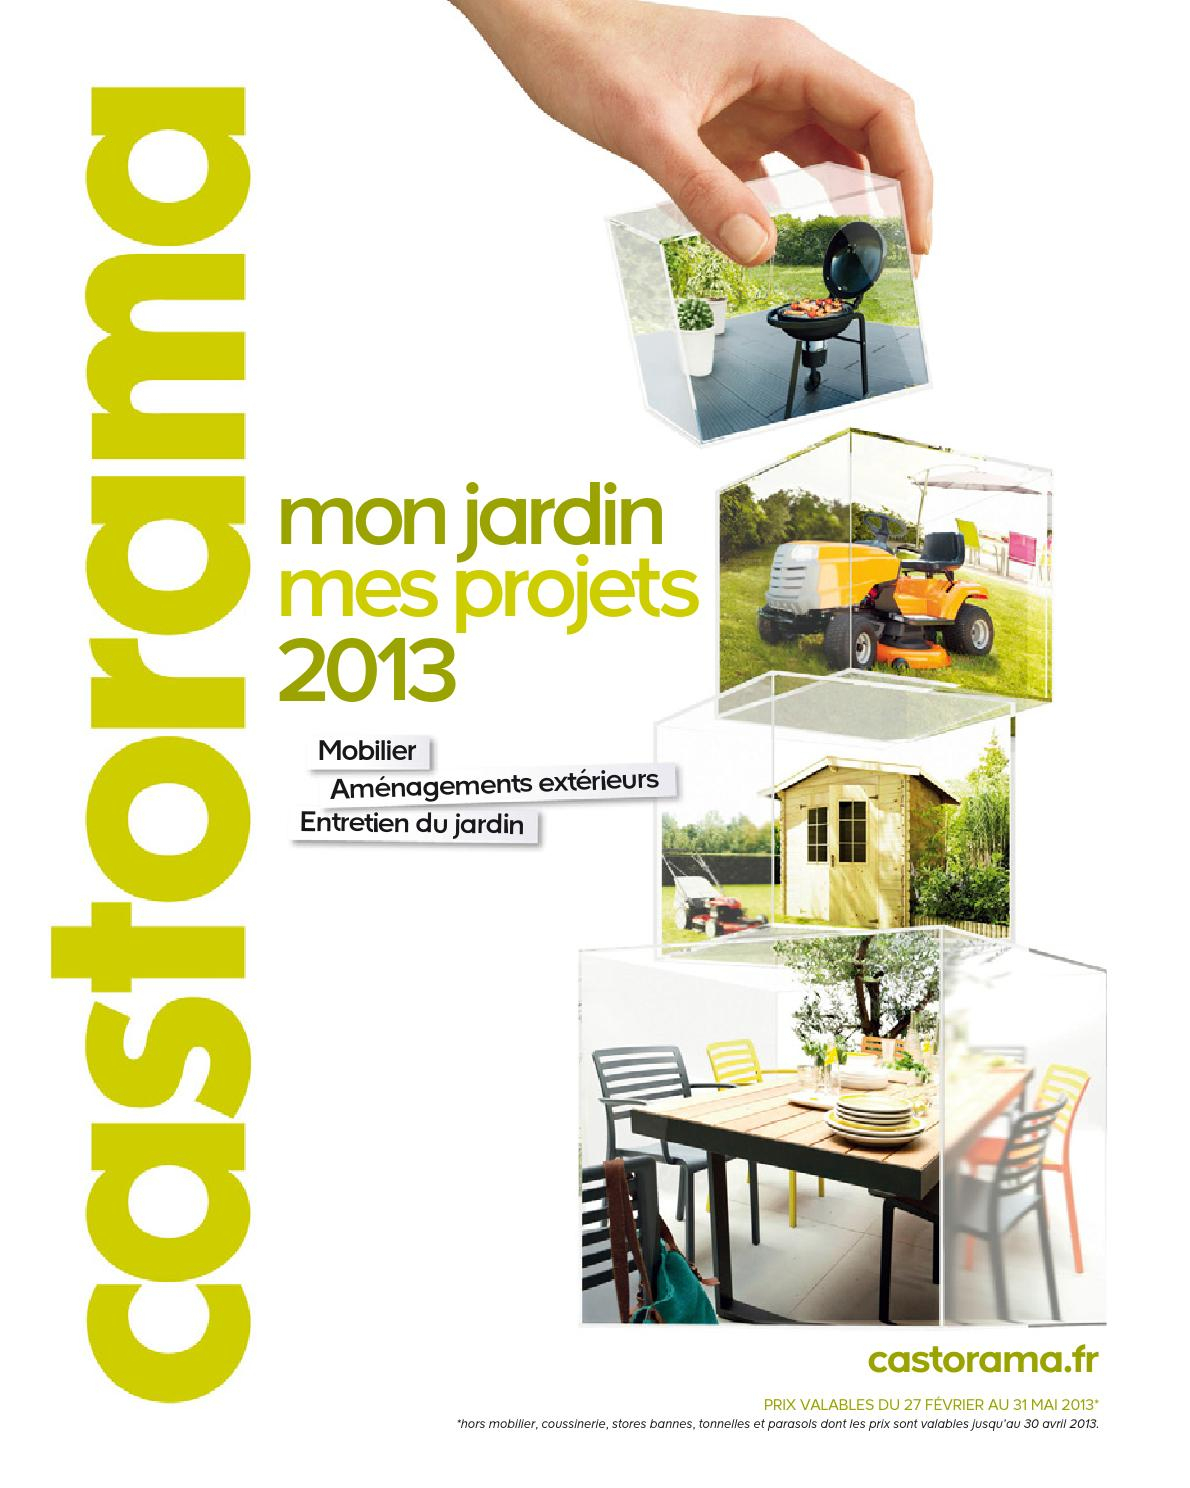 Catalogue Castorama Jardin Projets By Margot Ziegler - Issuu concernant Piscine Autoportée Castorama